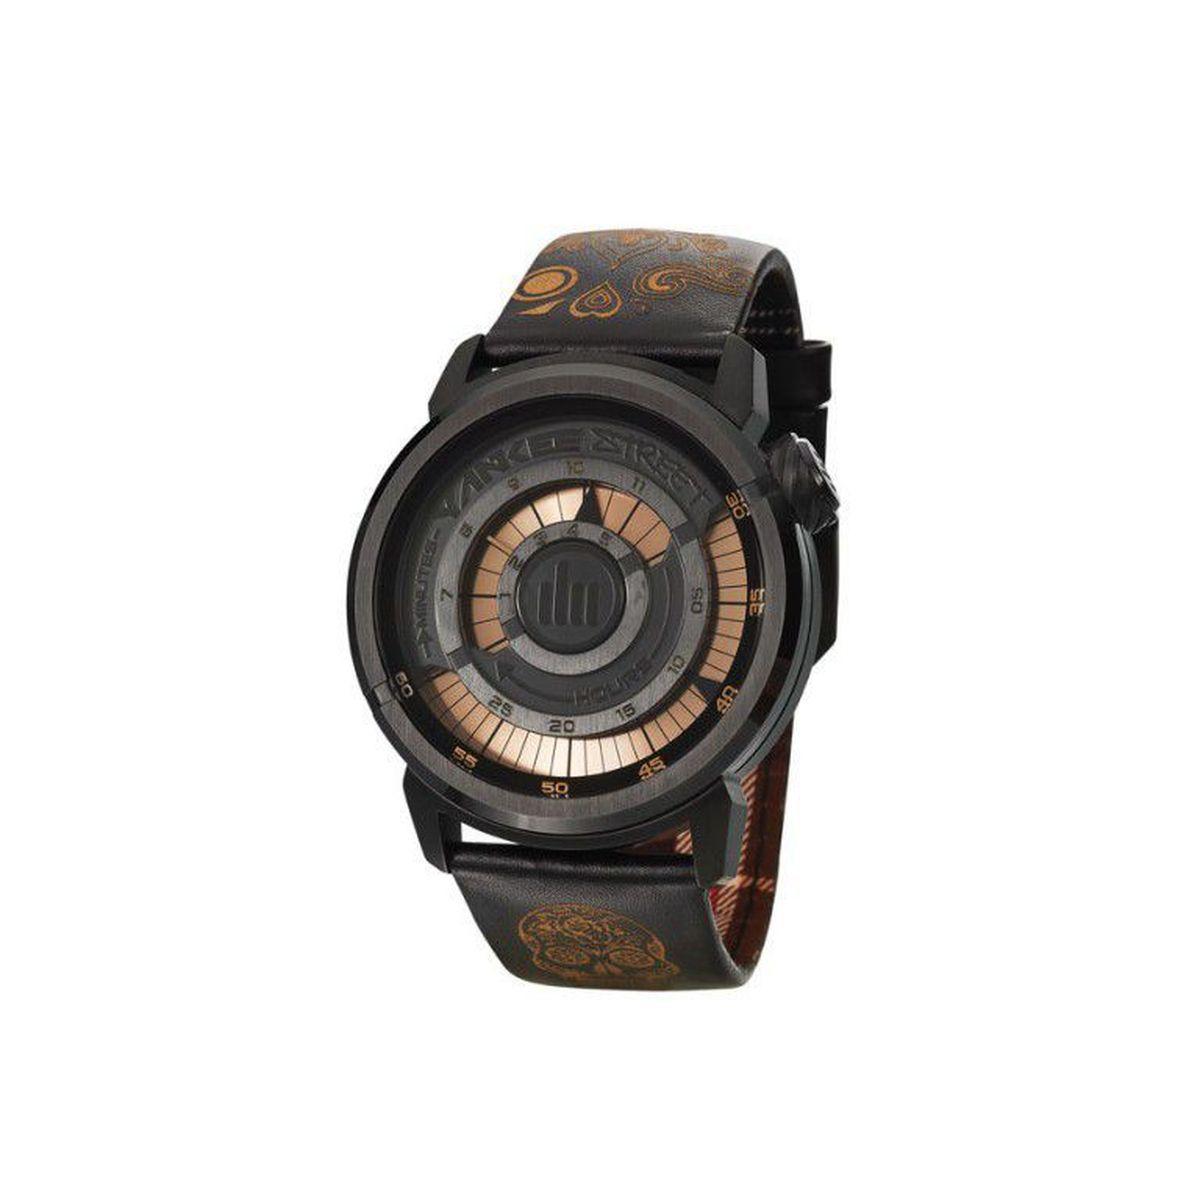 Relógio de Pulso Masculino Black Angels YS30247P